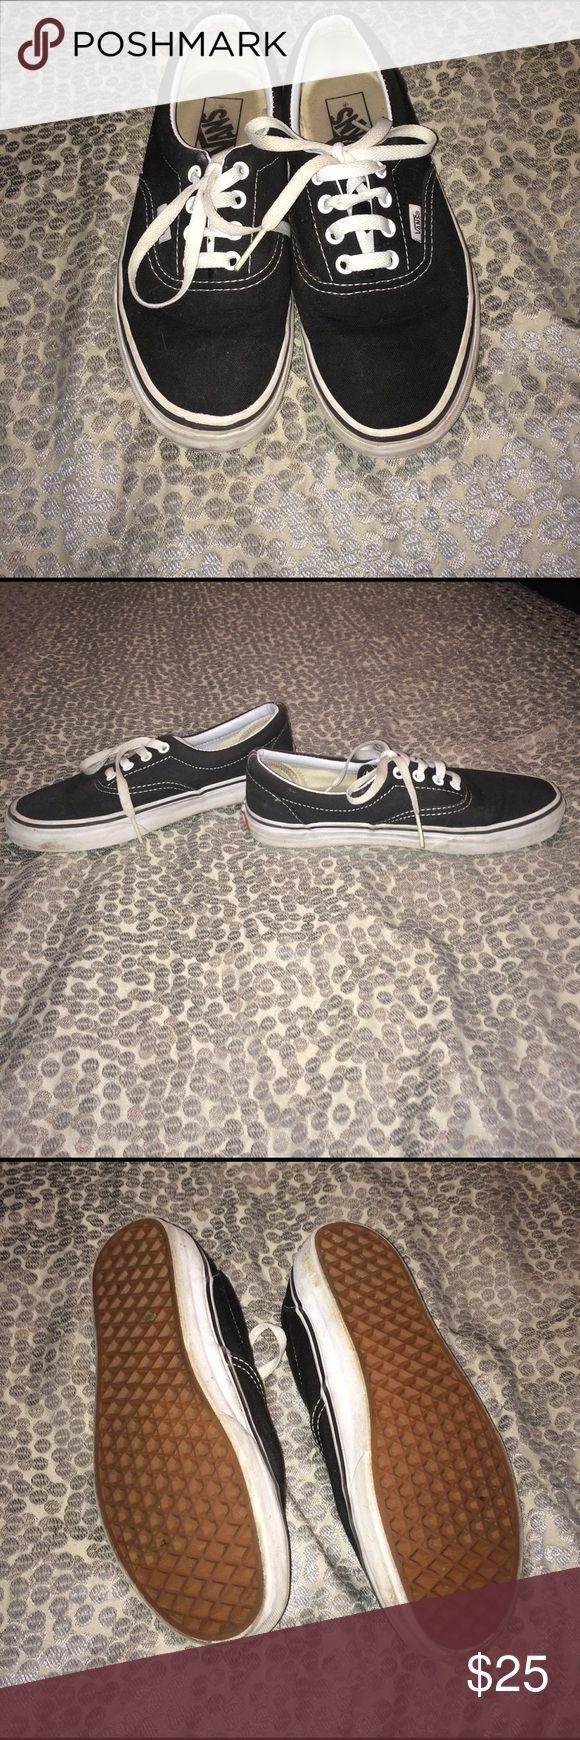 Black vans shoes lo cut Black lo cut Vans worn a few times,alittle dirt on edges but can be cleaned! Womens size 7.5 men's size 6! Vans Shoes Sneakers